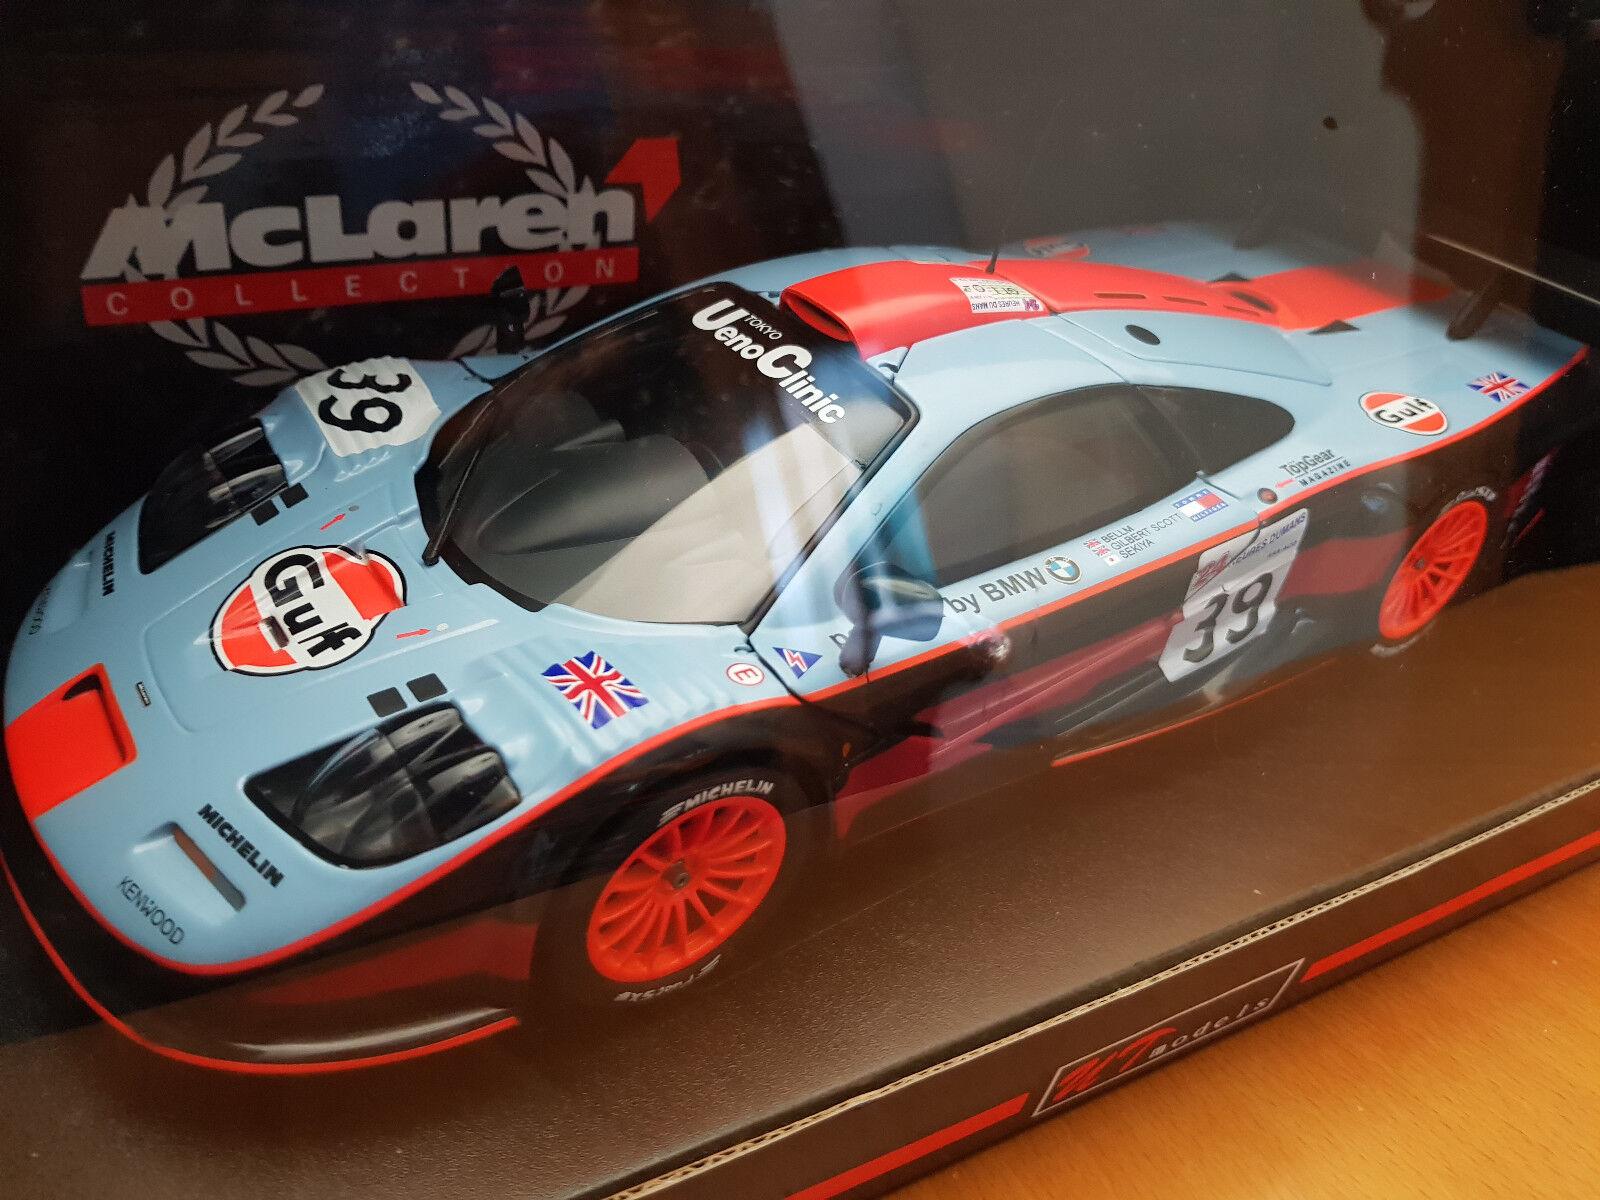 1:18 UT MODELS McLAREN F1 Long Tail #39 LE MANS 1997 GULF